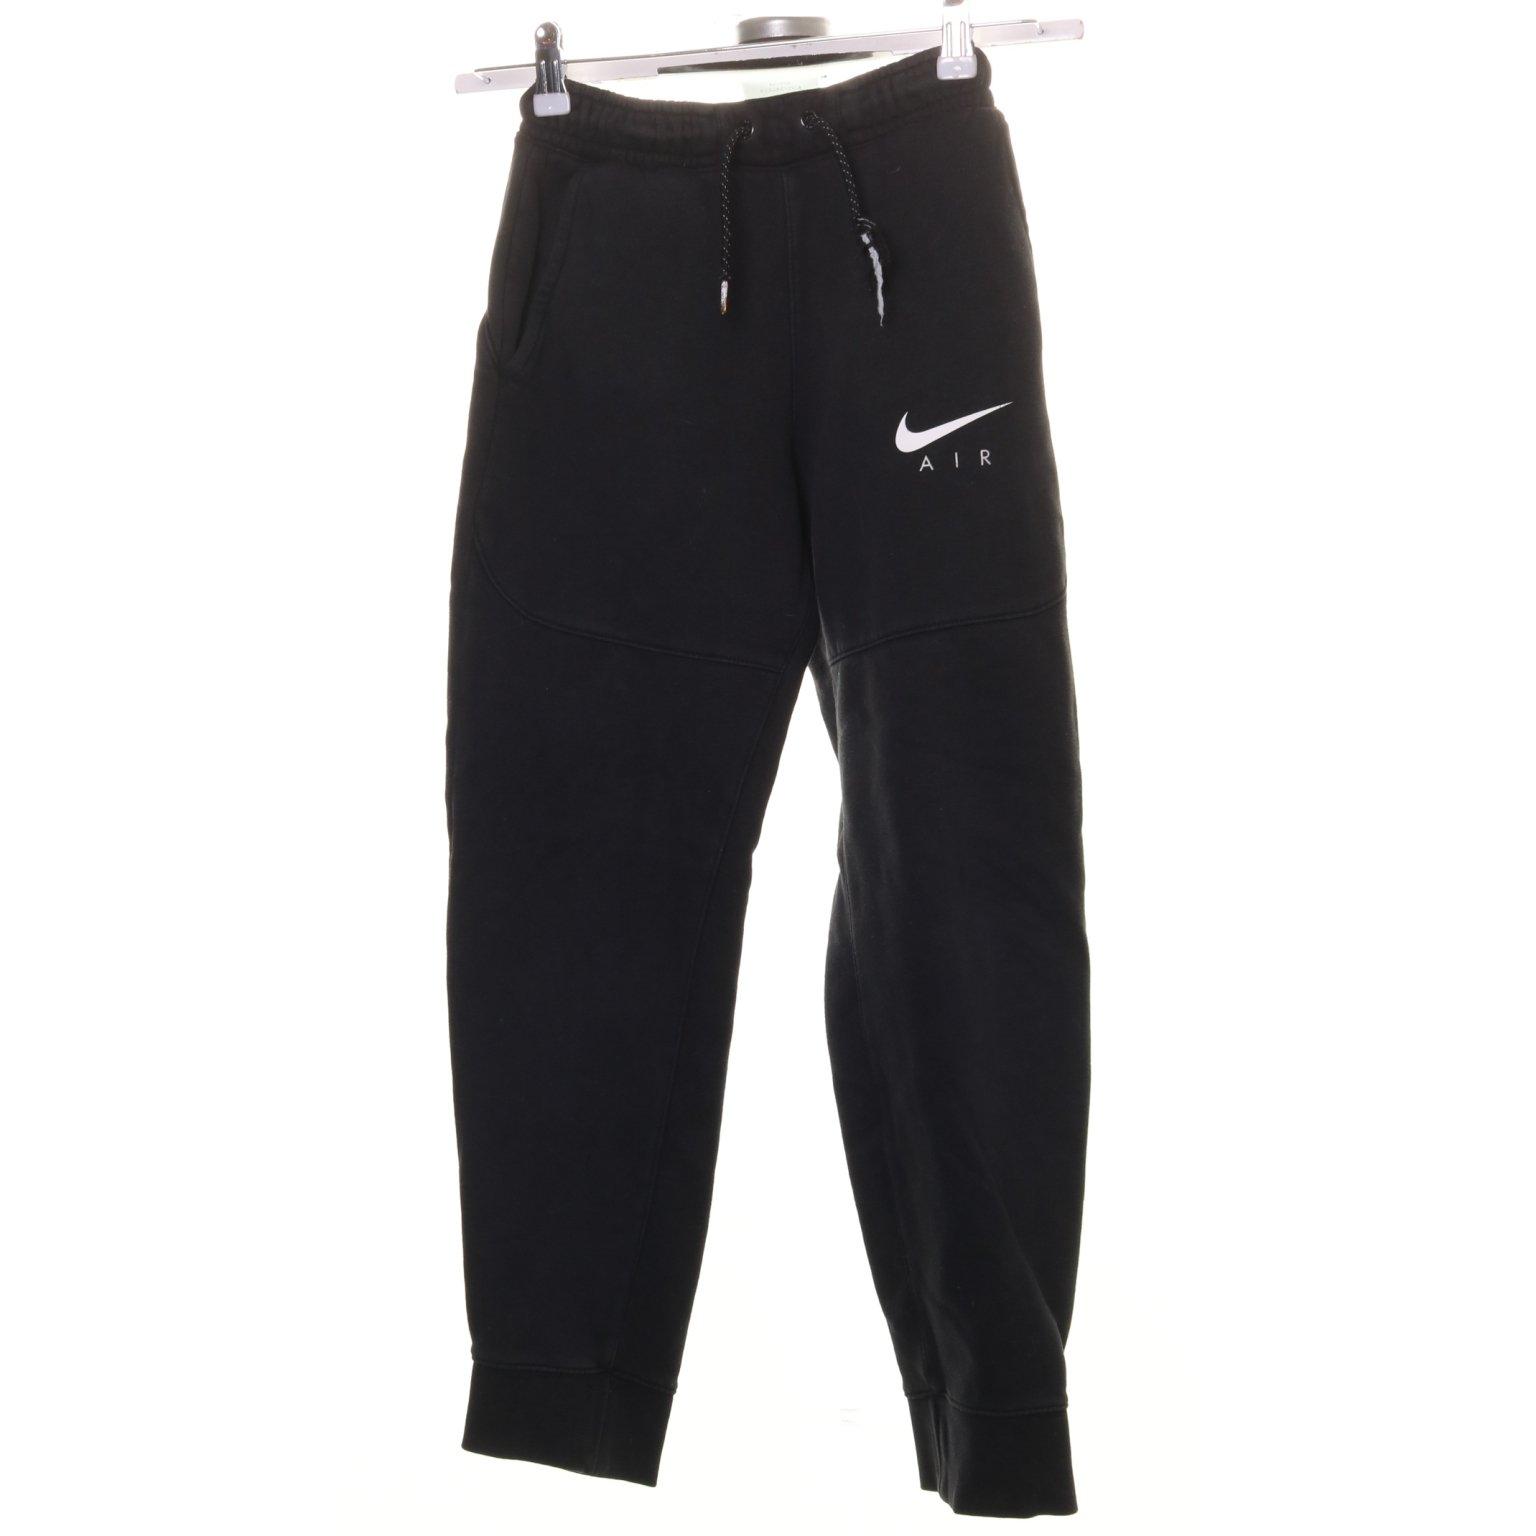 Nike Dri Fit, Träningsbyxor, Strl: 147 158, SvartFlerfärgad